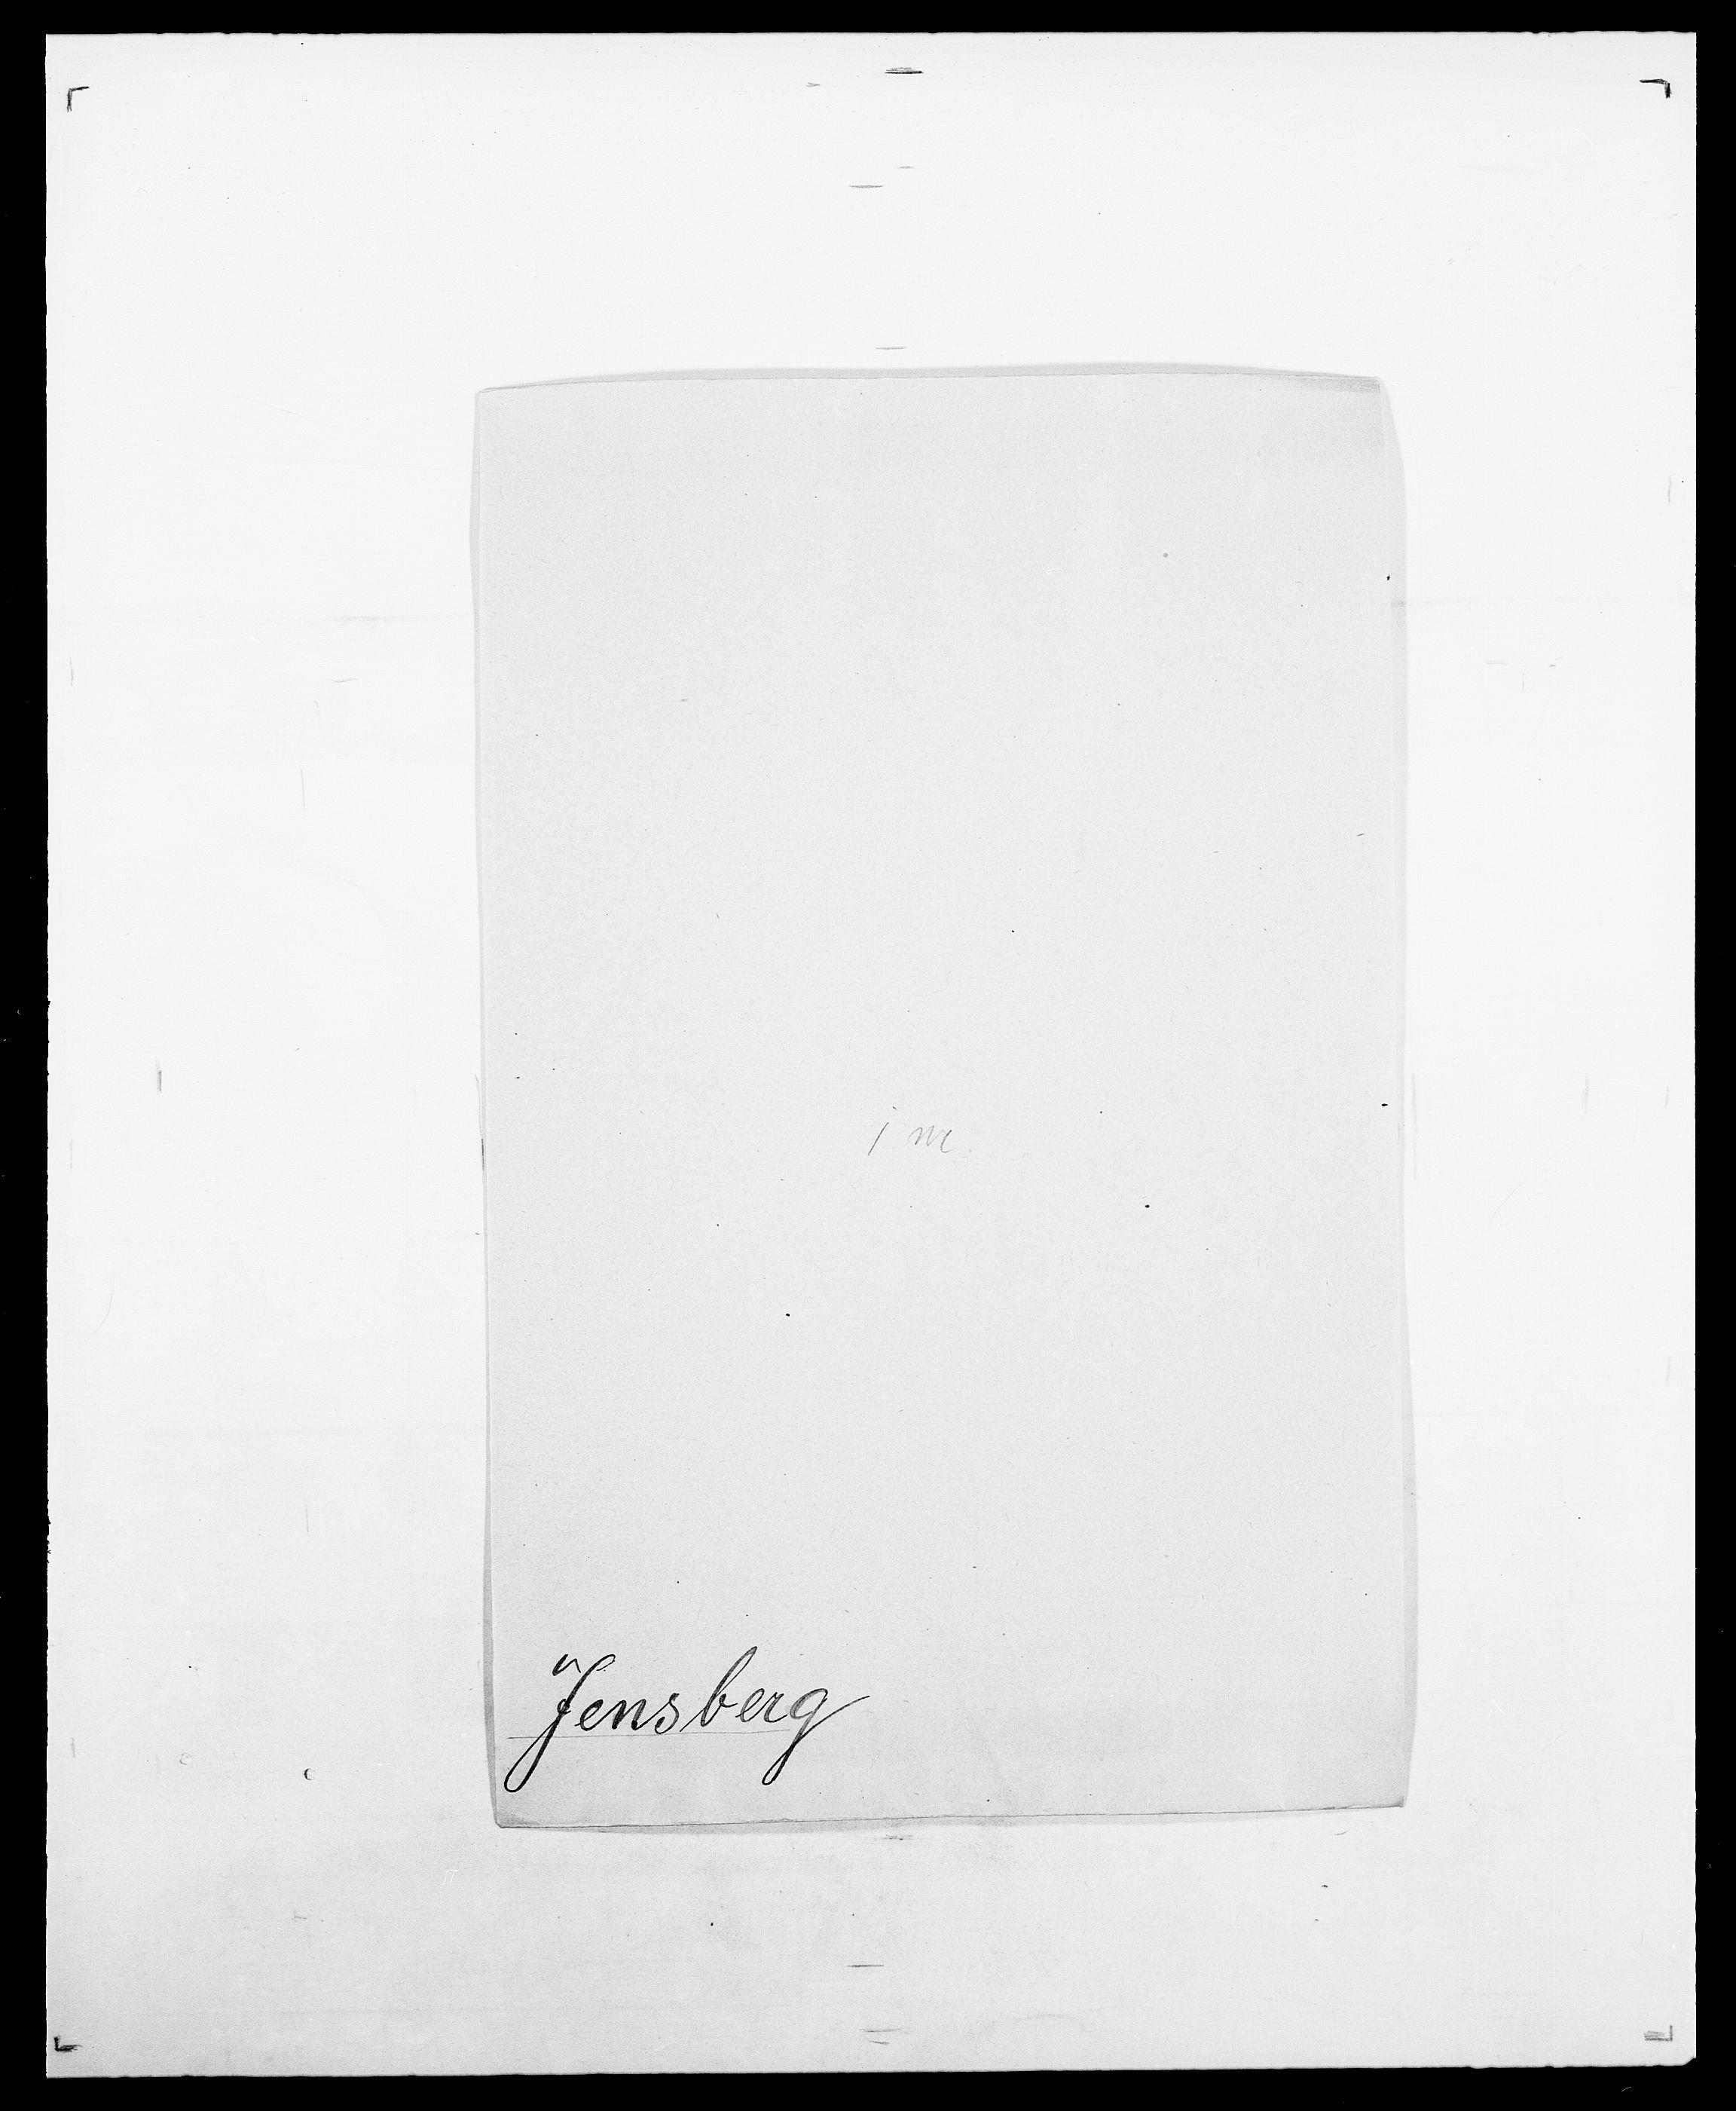 SAO, Delgobe, Charles Antoine - samling, D/Da/L0019: van der Hude - Joys, s. 633